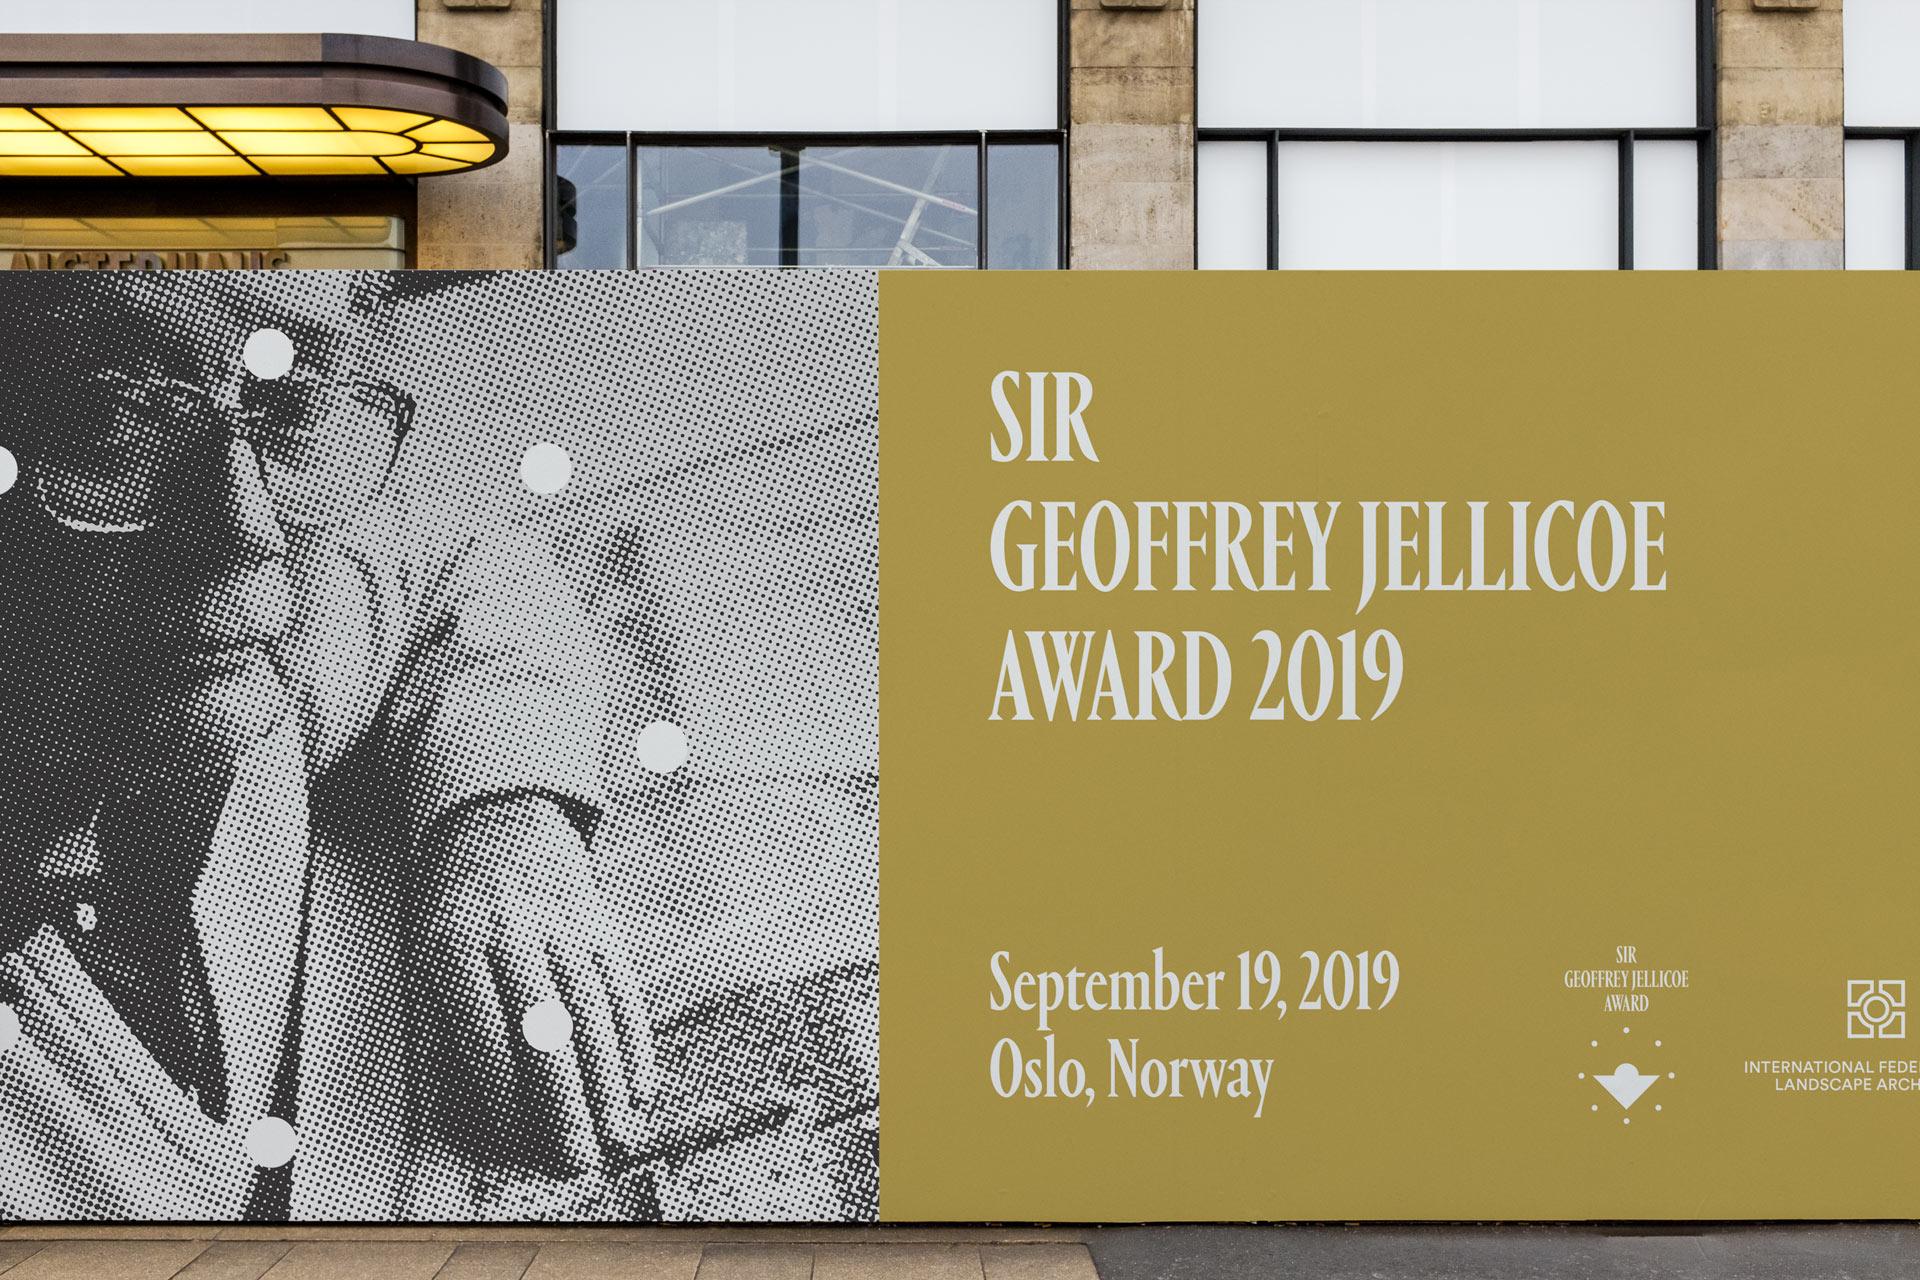 The IFLA Sir Geoffrey Jellicoe Award